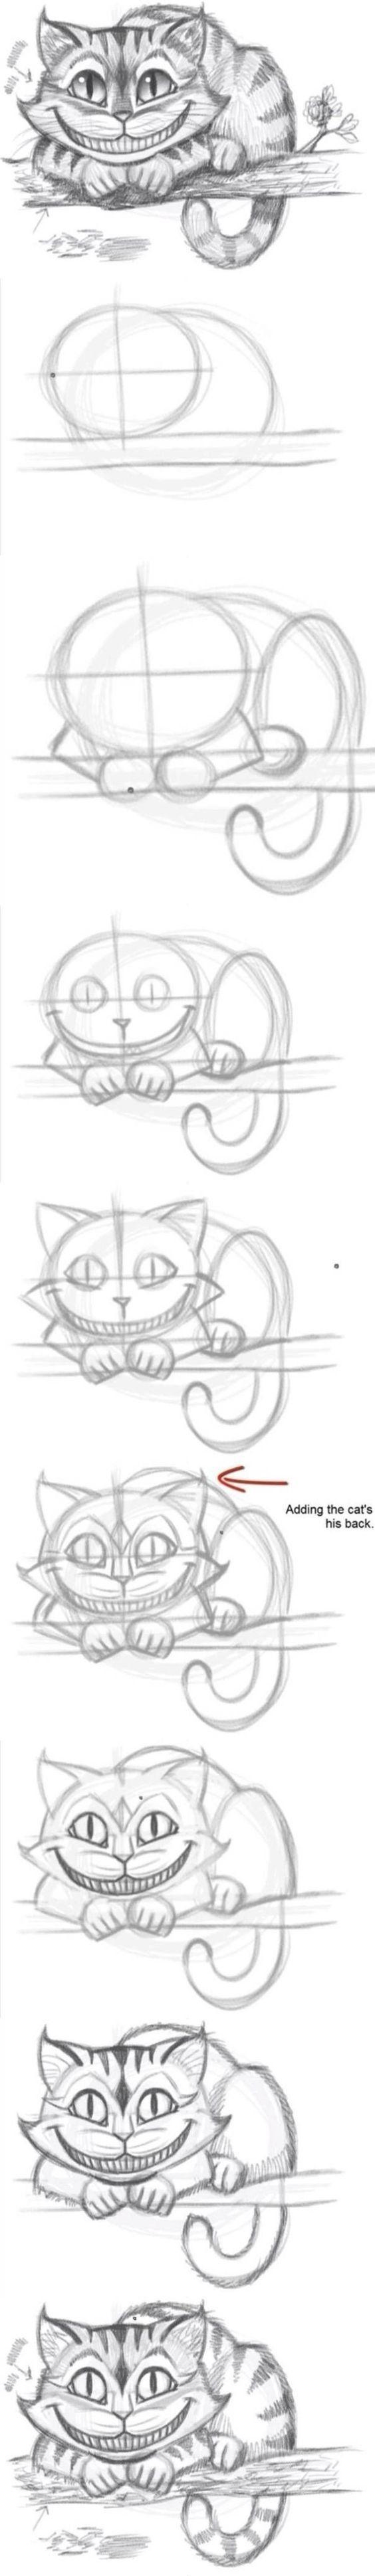 Уроки рисования карандашом. Чеширский кот